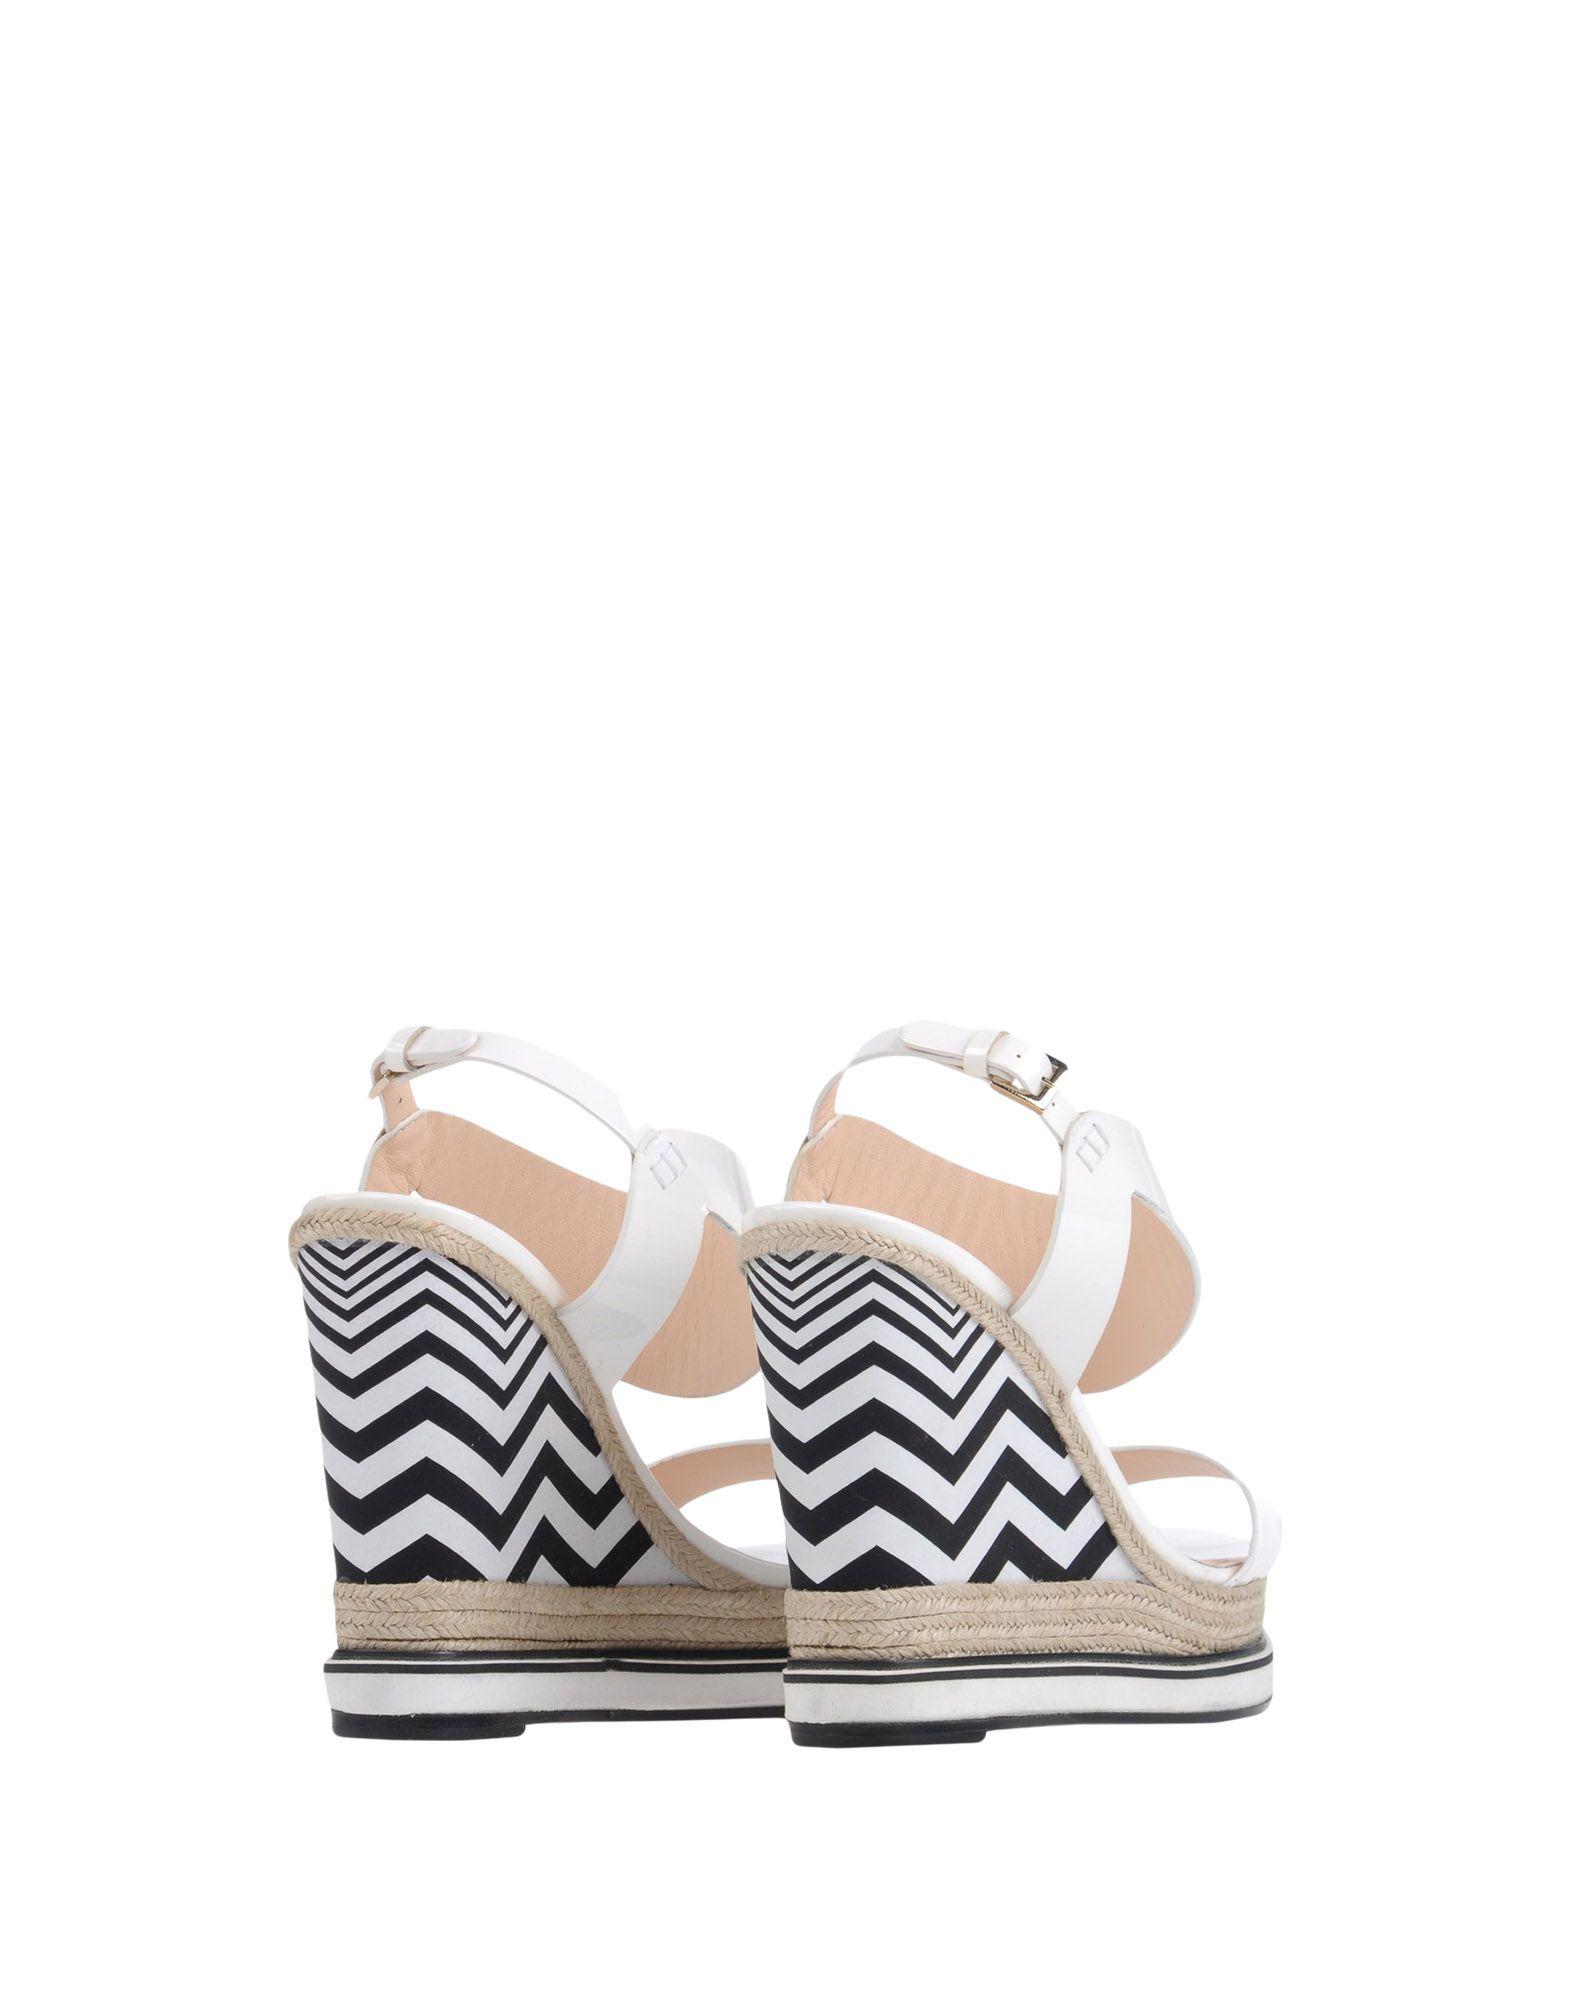 Nicholas Kirkwood Espadrilles Damen  11196123VVGut aussehende strapazierfähige Schuhe